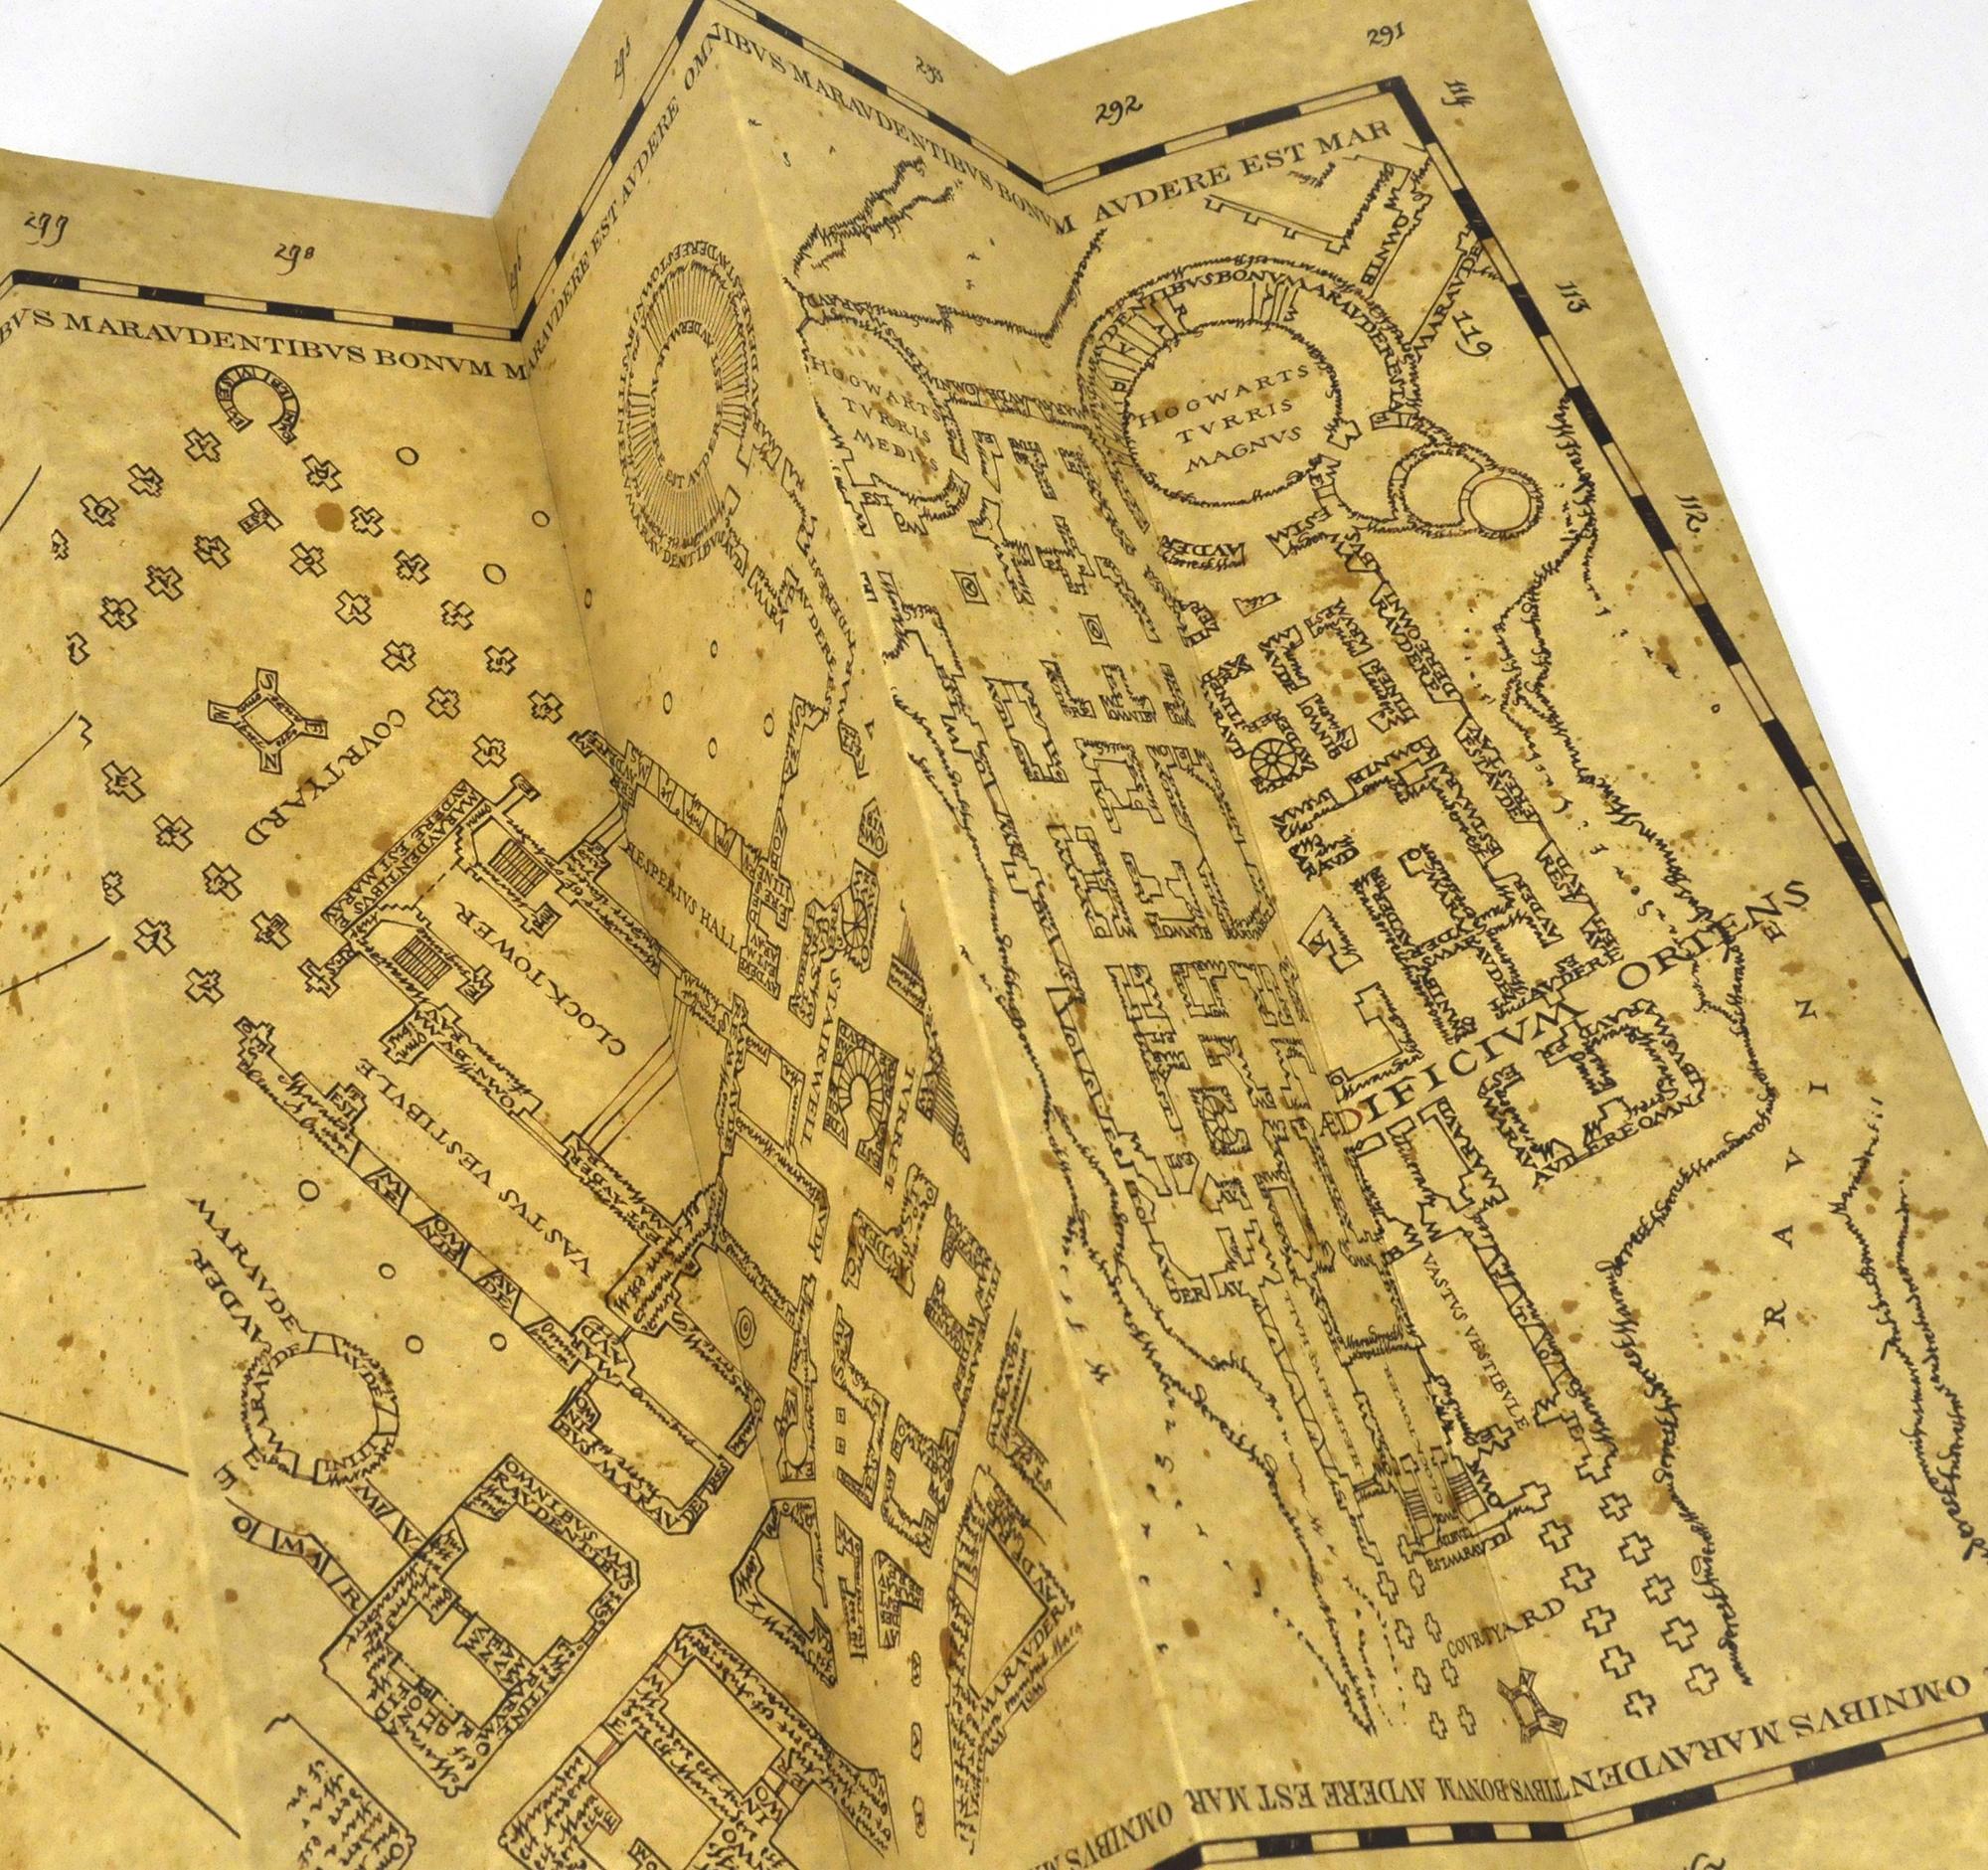 Harry Potter Replica The Marauder Map